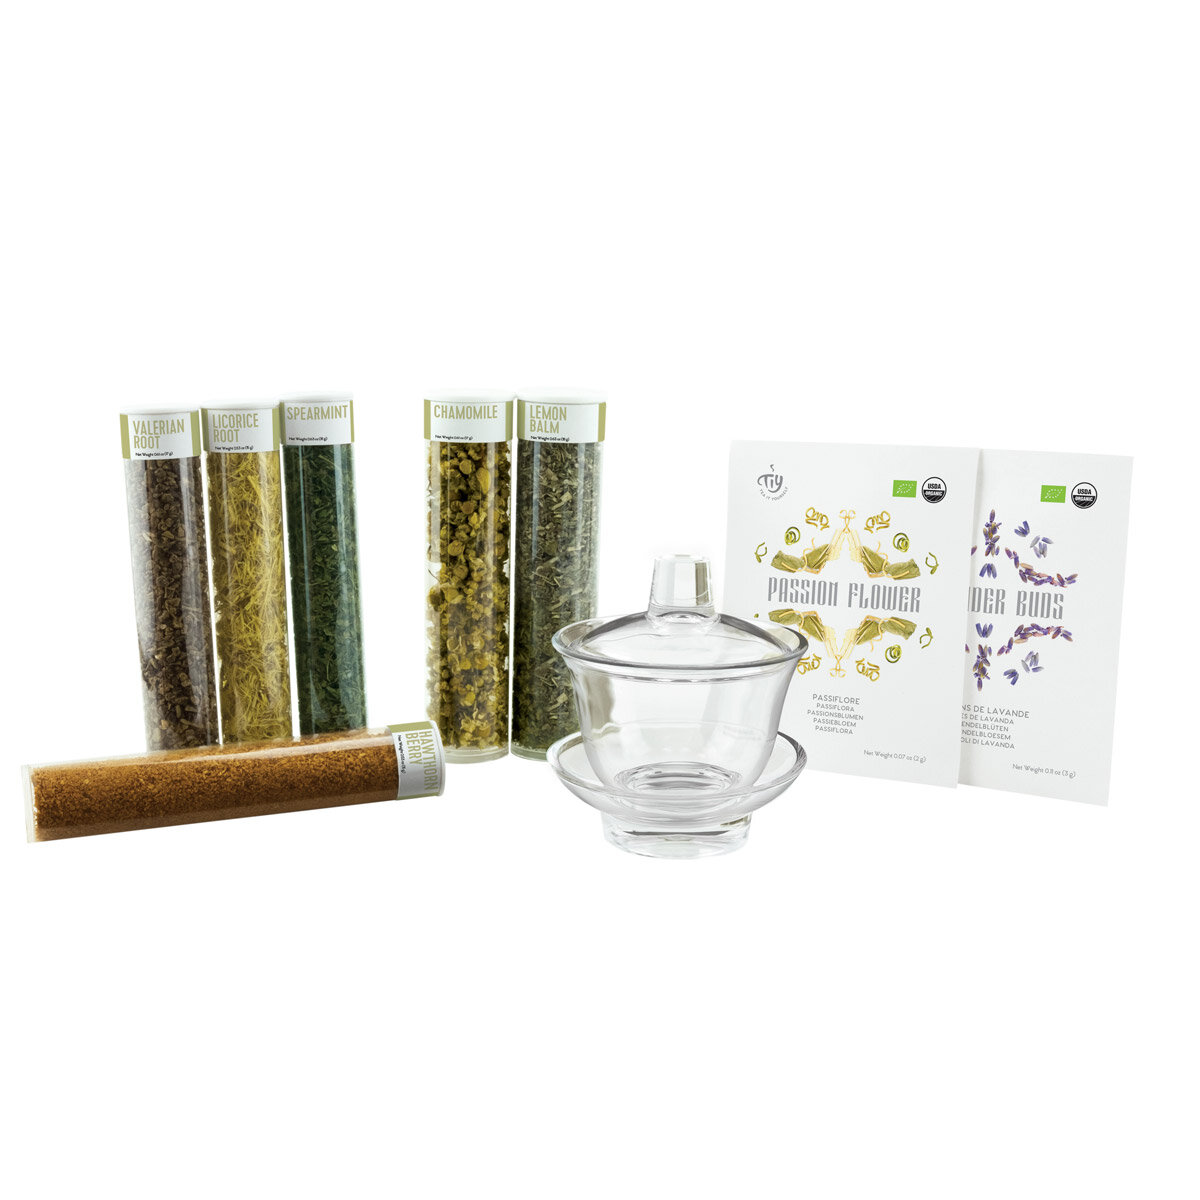 Teaityourself Tea It Yourself No Stress Organic Herbal Infusion Kit Wayfair